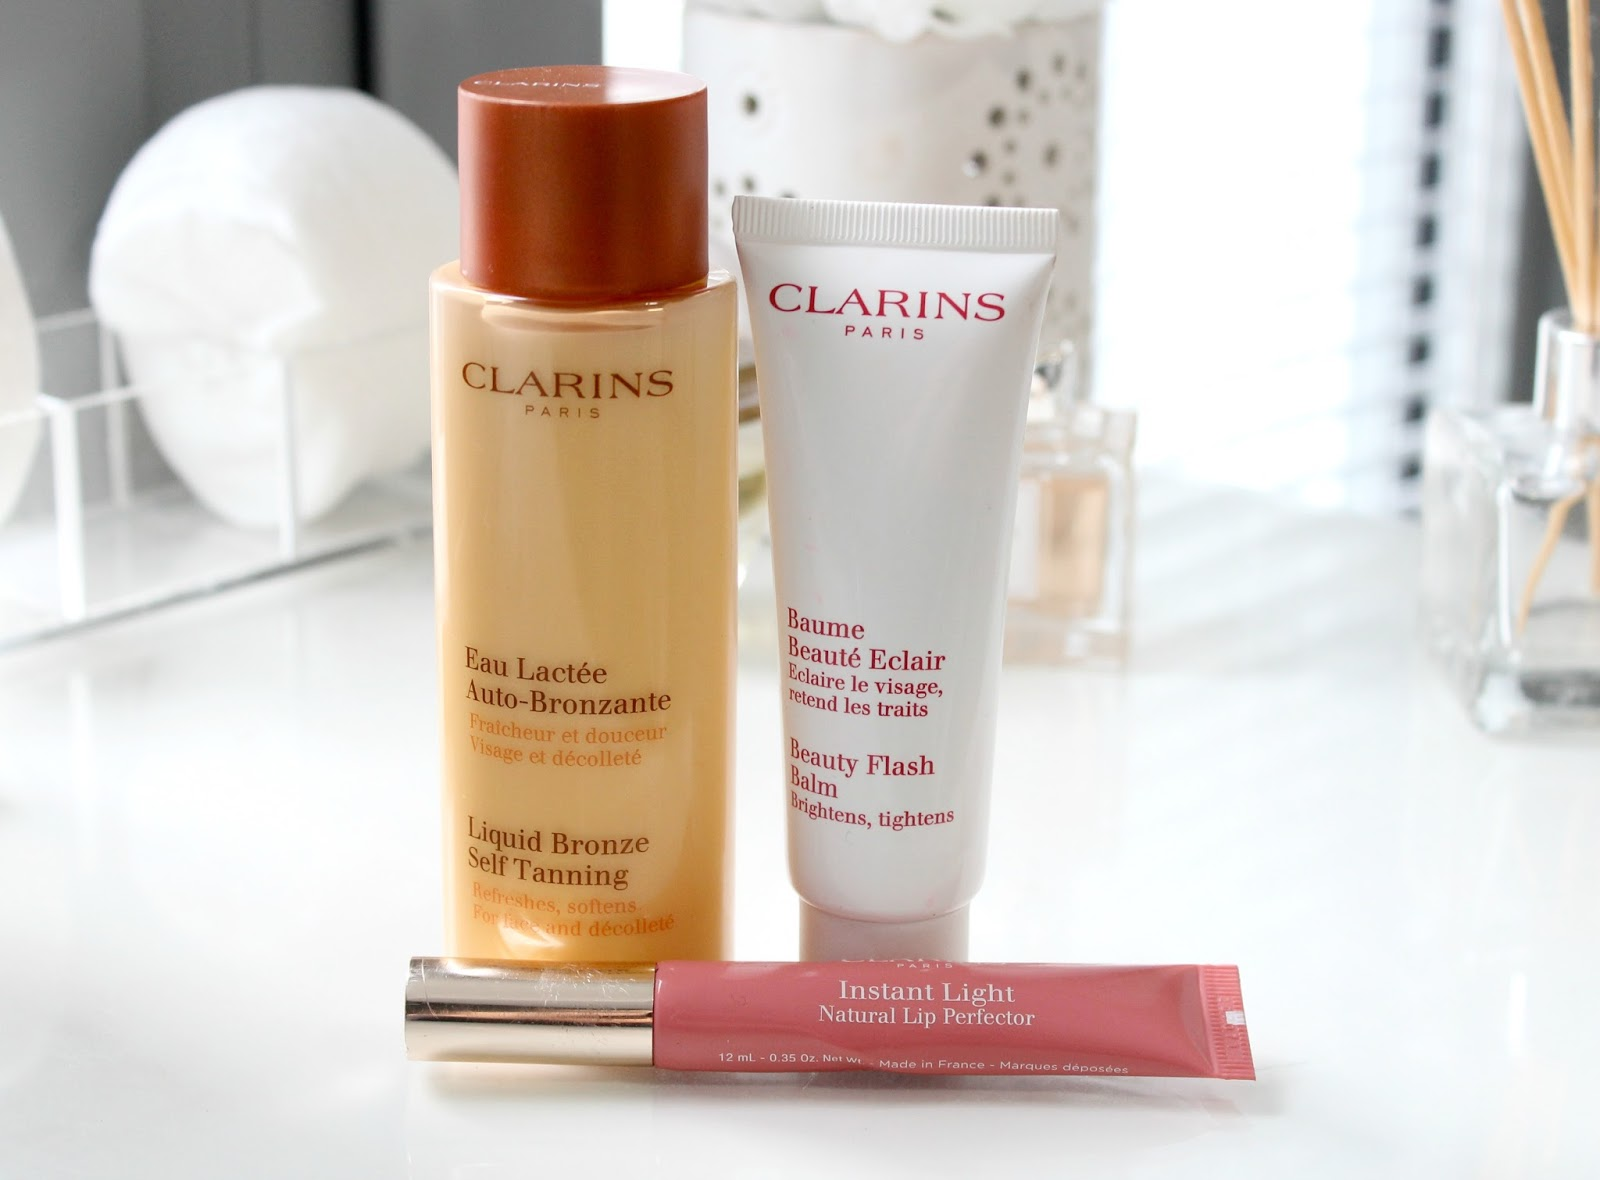 clarins online uk